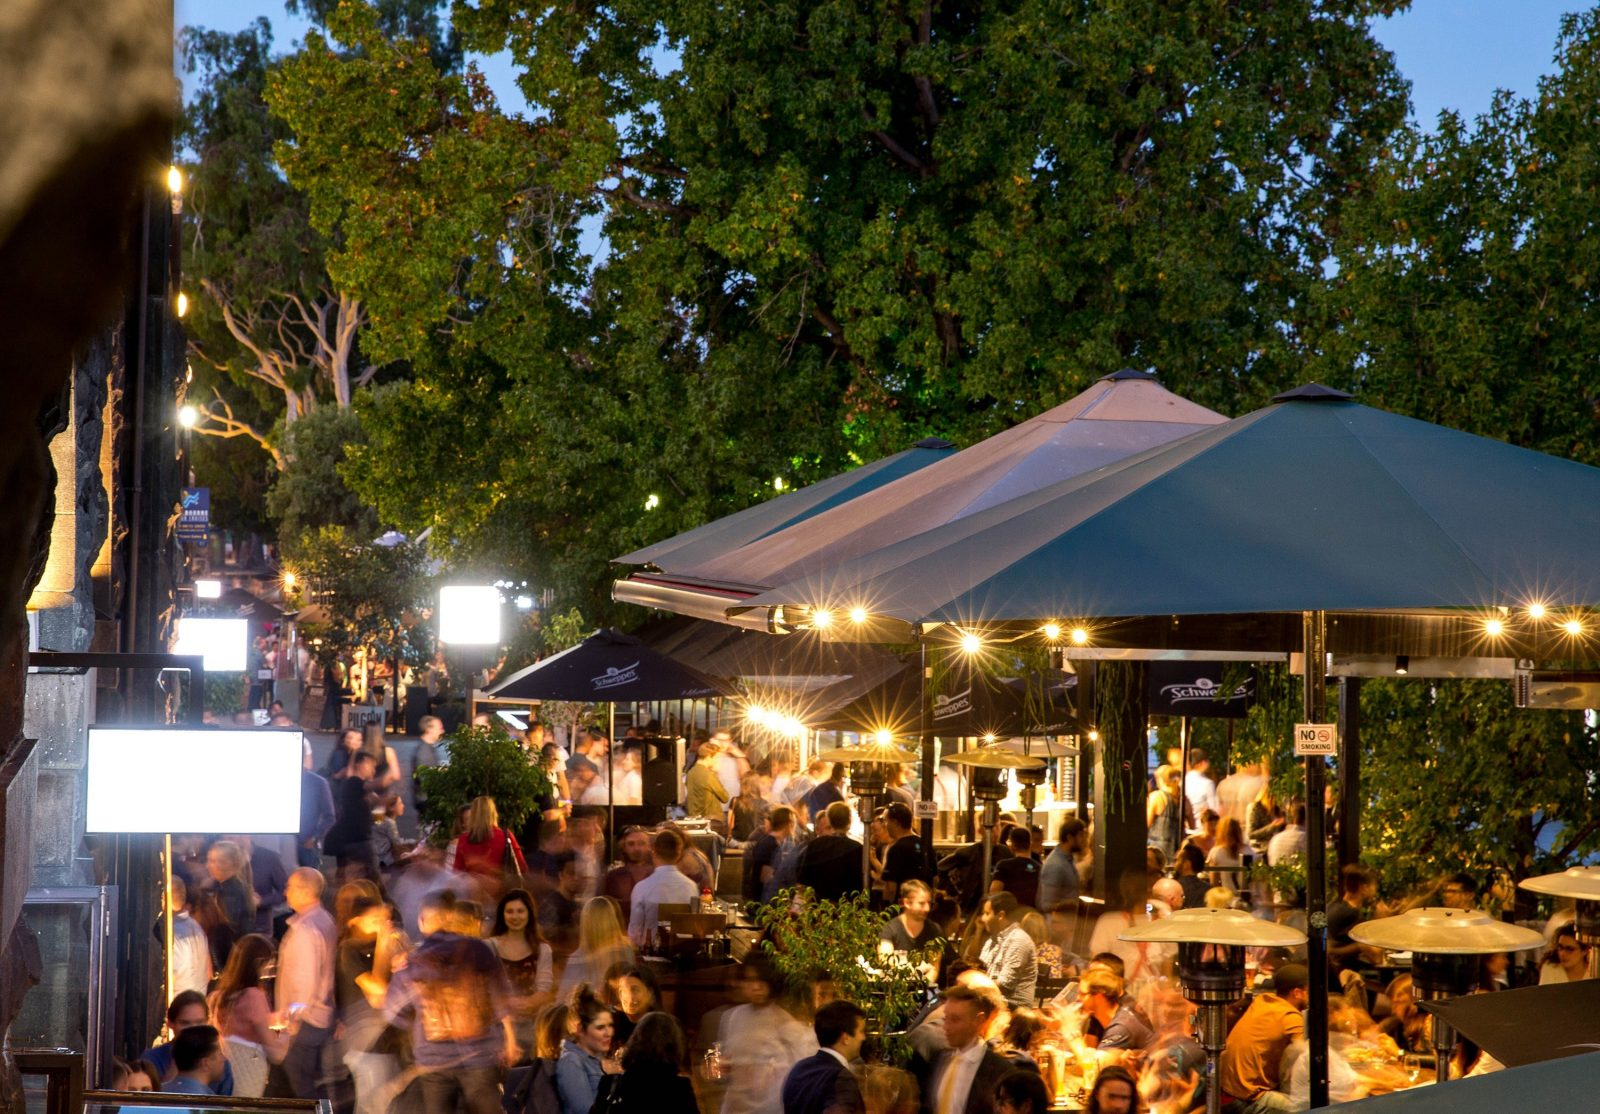 A crowd of people at Riverland Bar at night